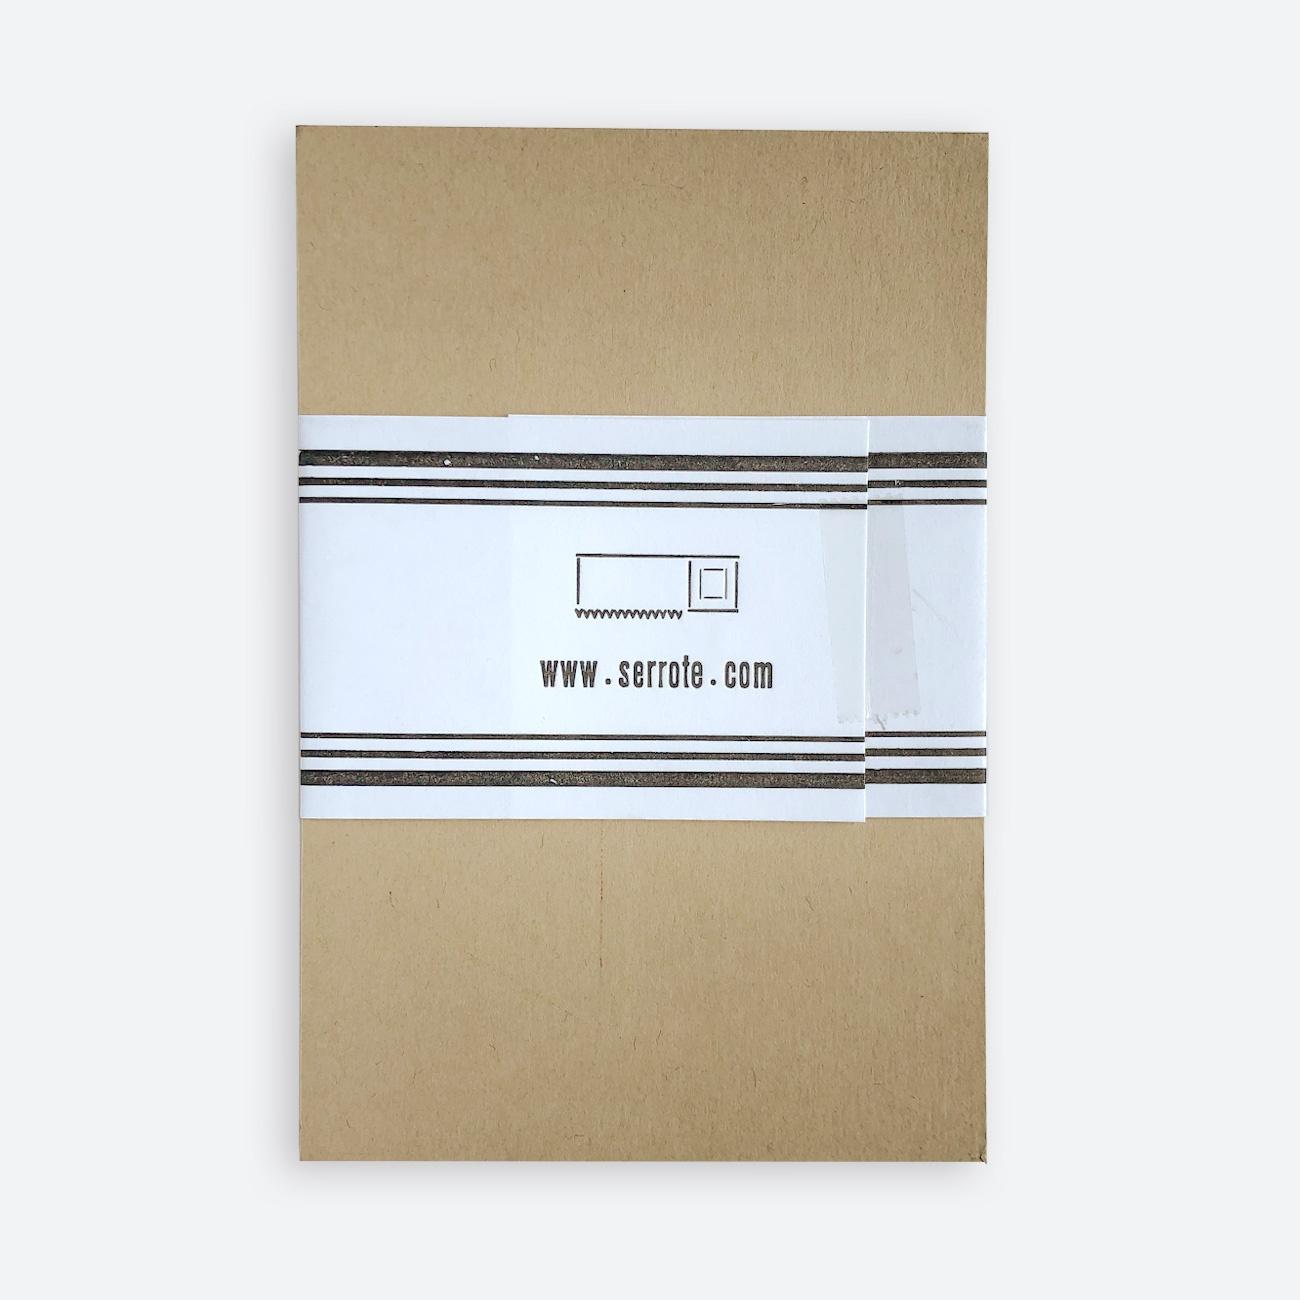 Serrote Postkartenset, 12 Kartren, Rückseite,